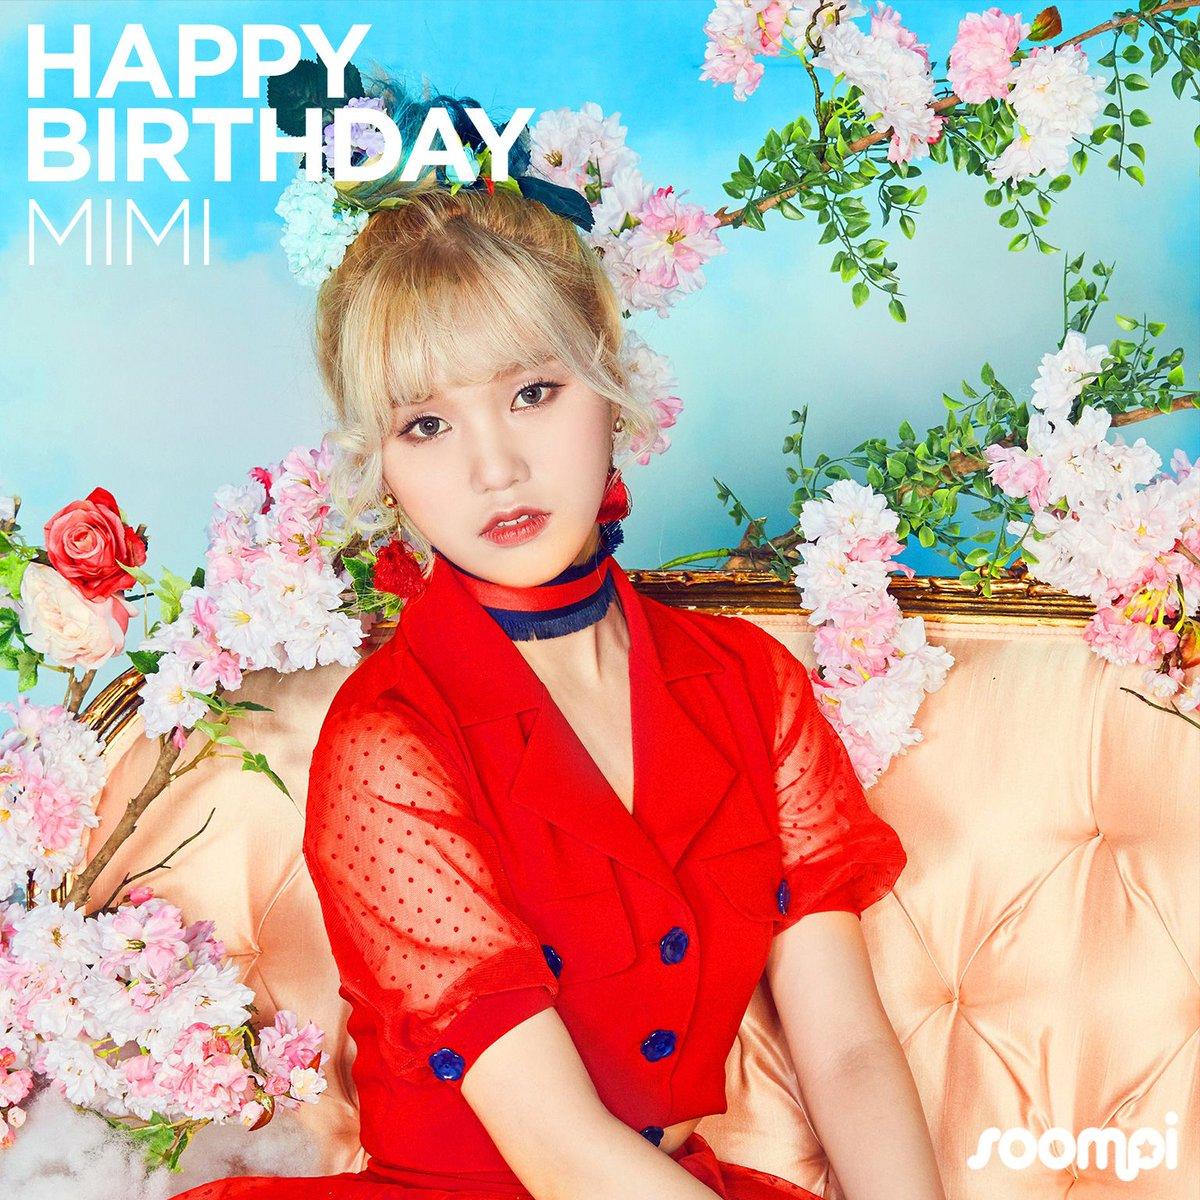 Happy Birthday to #OhMyGirl's Mimi! #HappyMimiDay https://t.co/1vJqnzp...